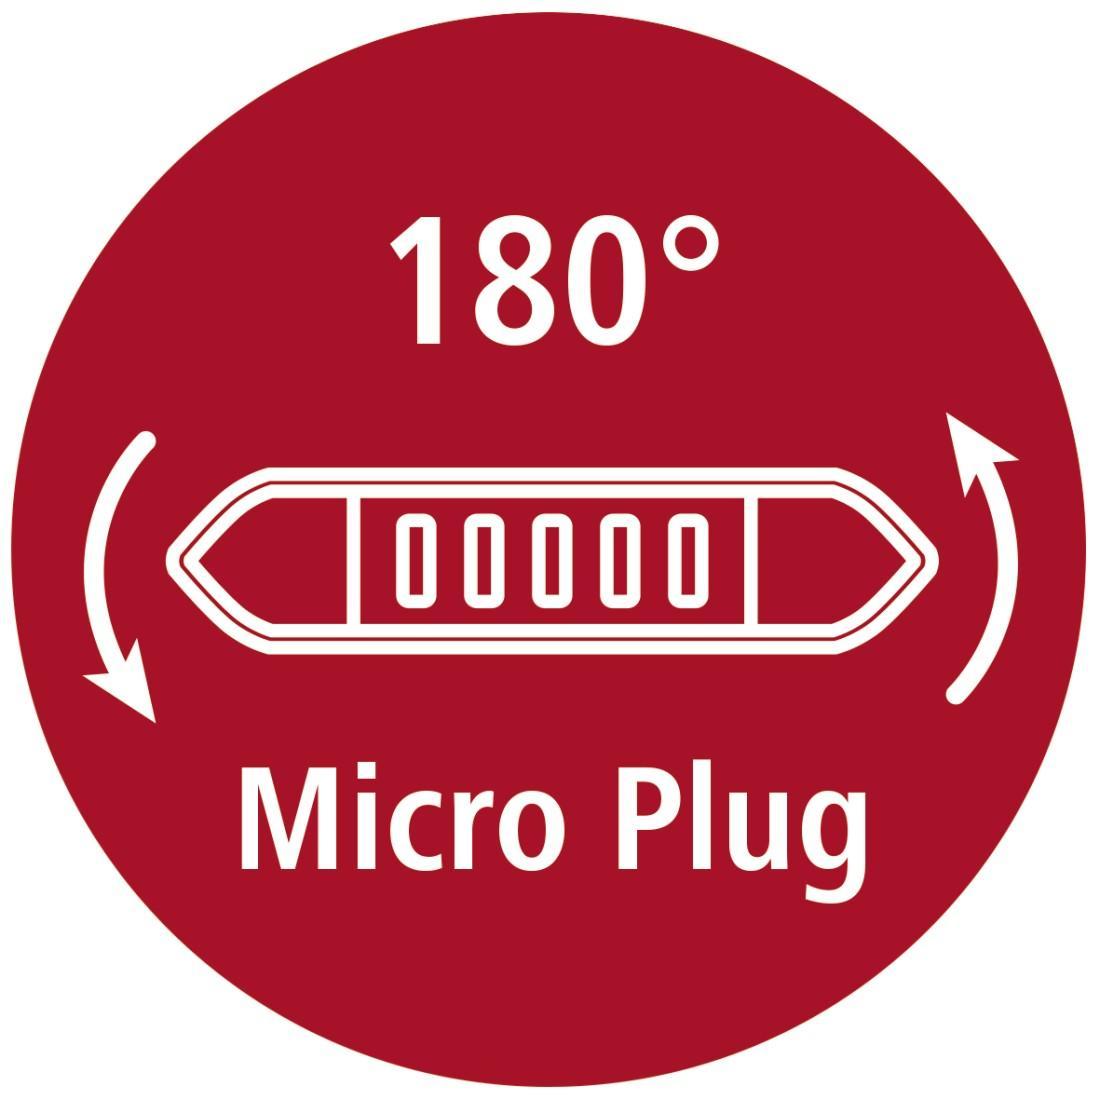 Кабел HAMA Flexi-Slim 135702 Micro USB, 0.75 м., Позлатени конектори, Зелен